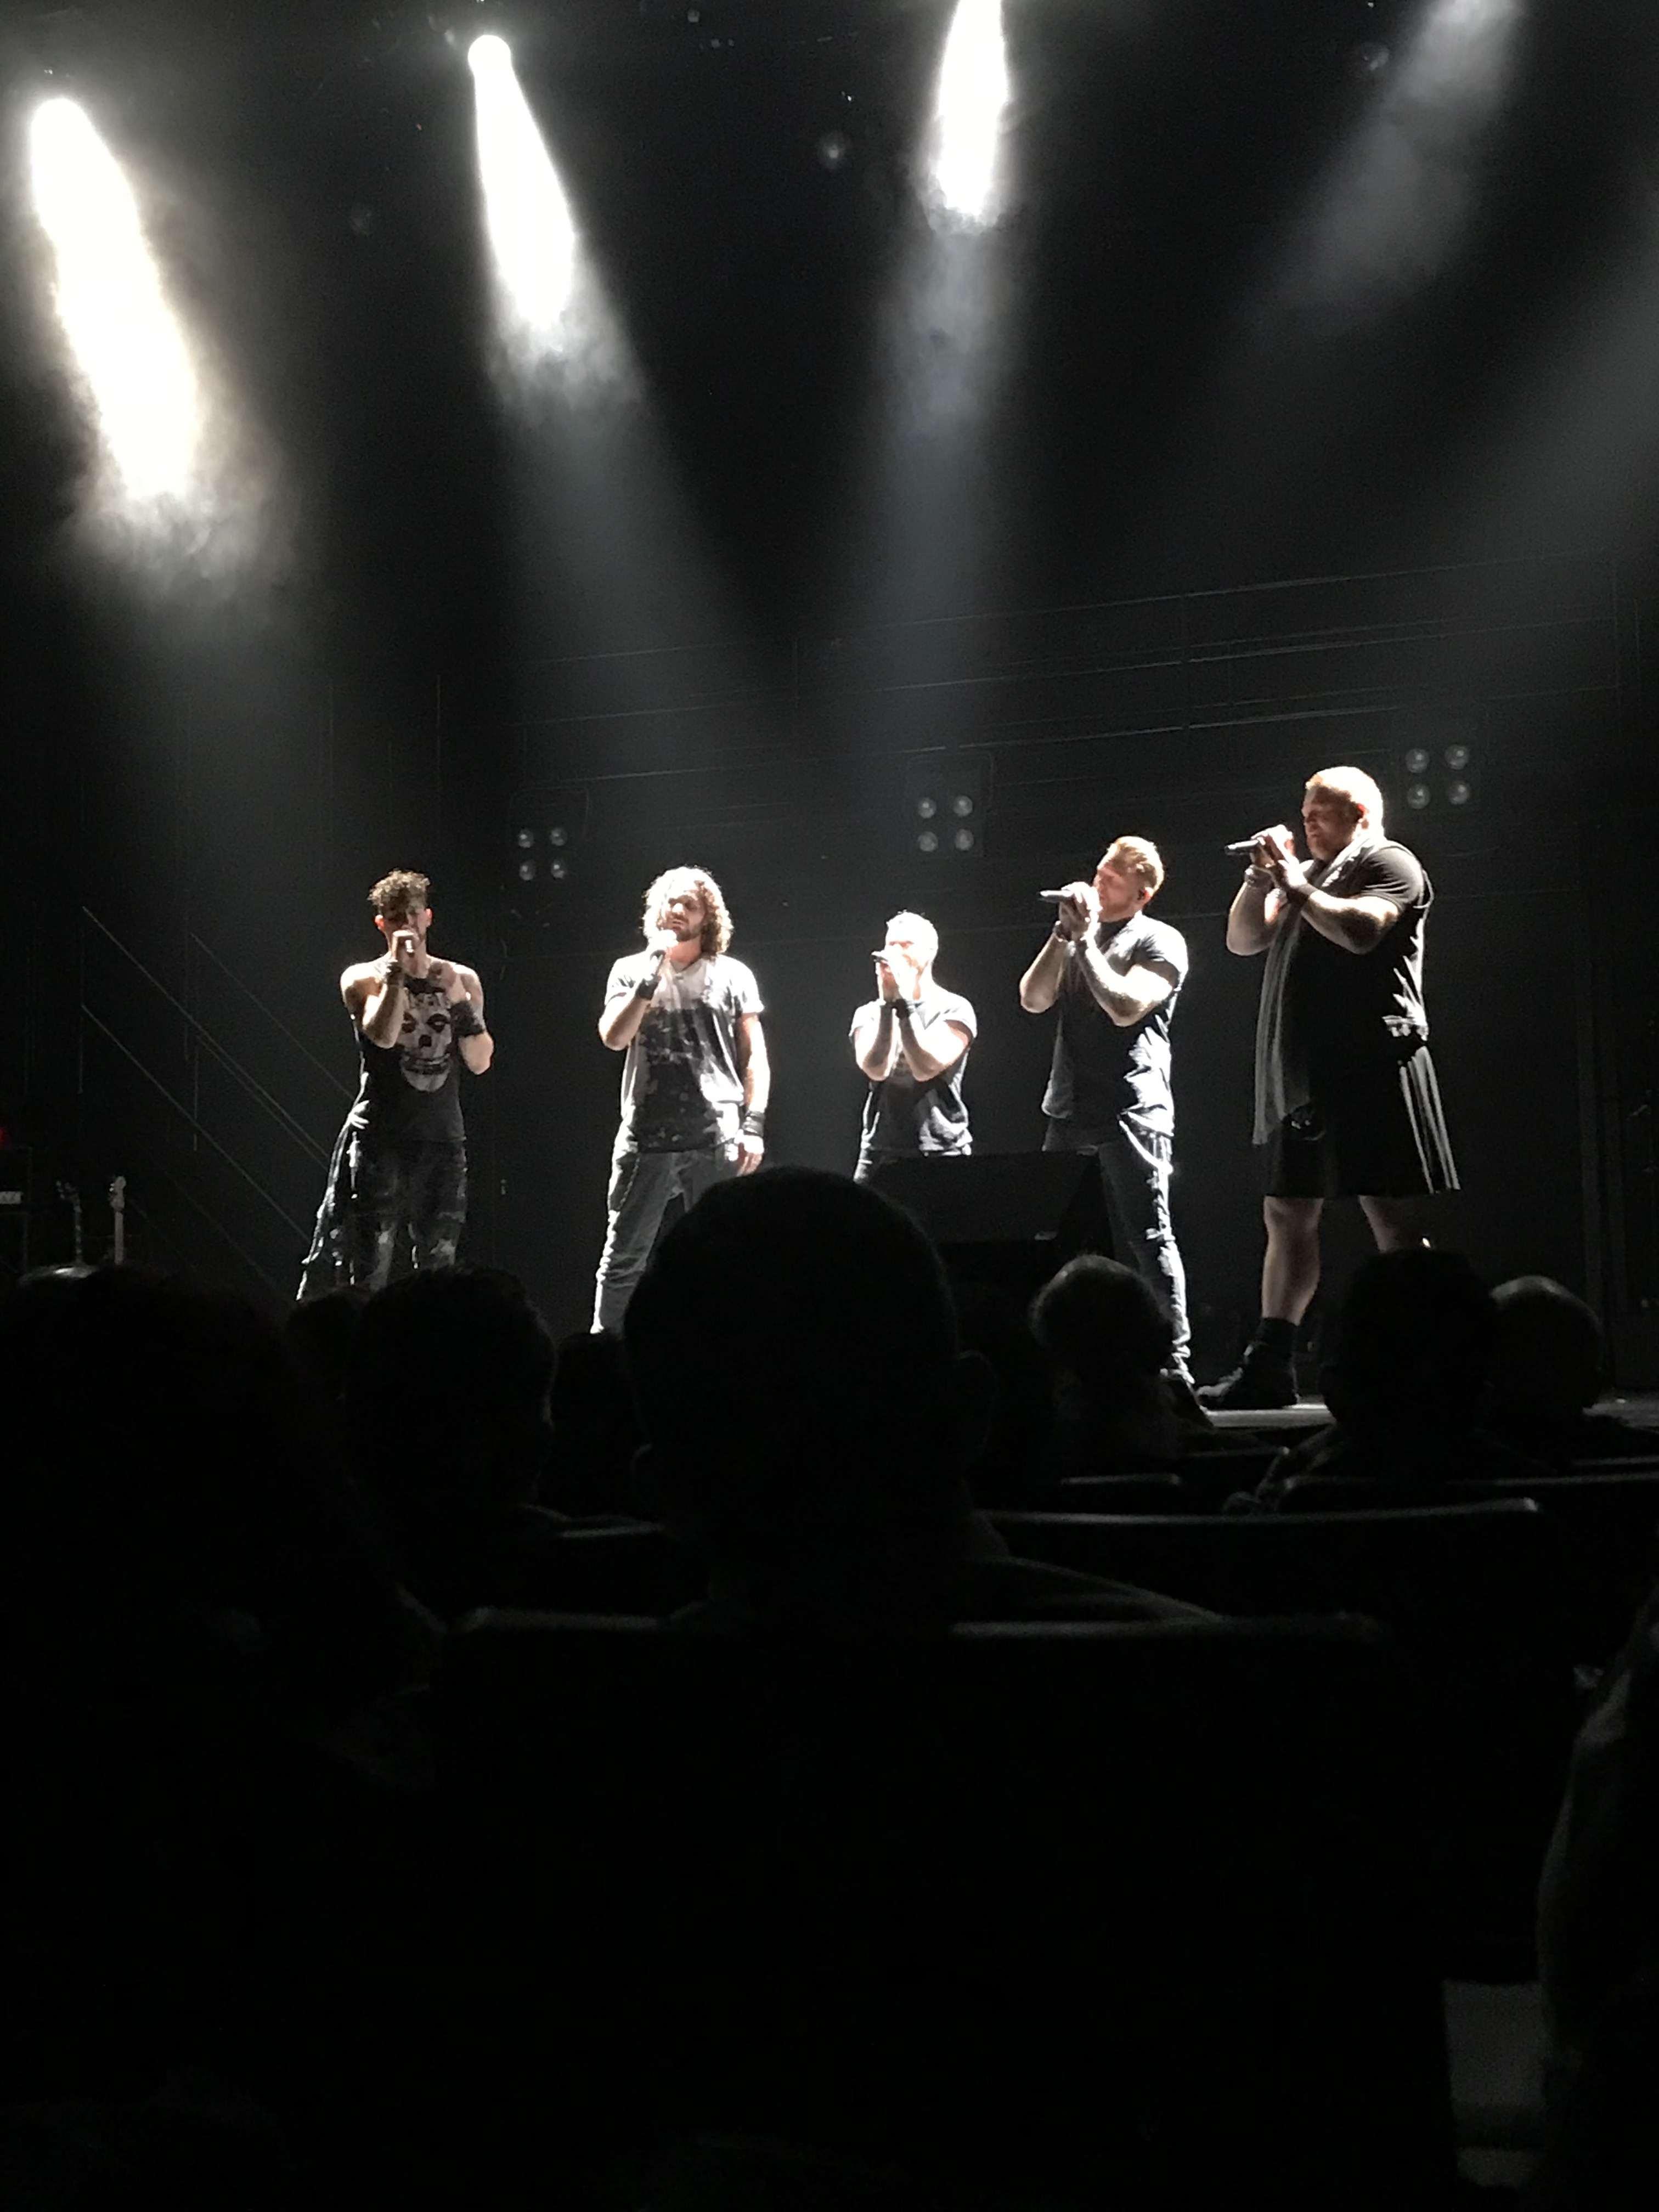 The Tenors of Rock   British Rock Band at Harrah's Las Vegas   Elle Blonde Luxury Lifestyle Destination Blog